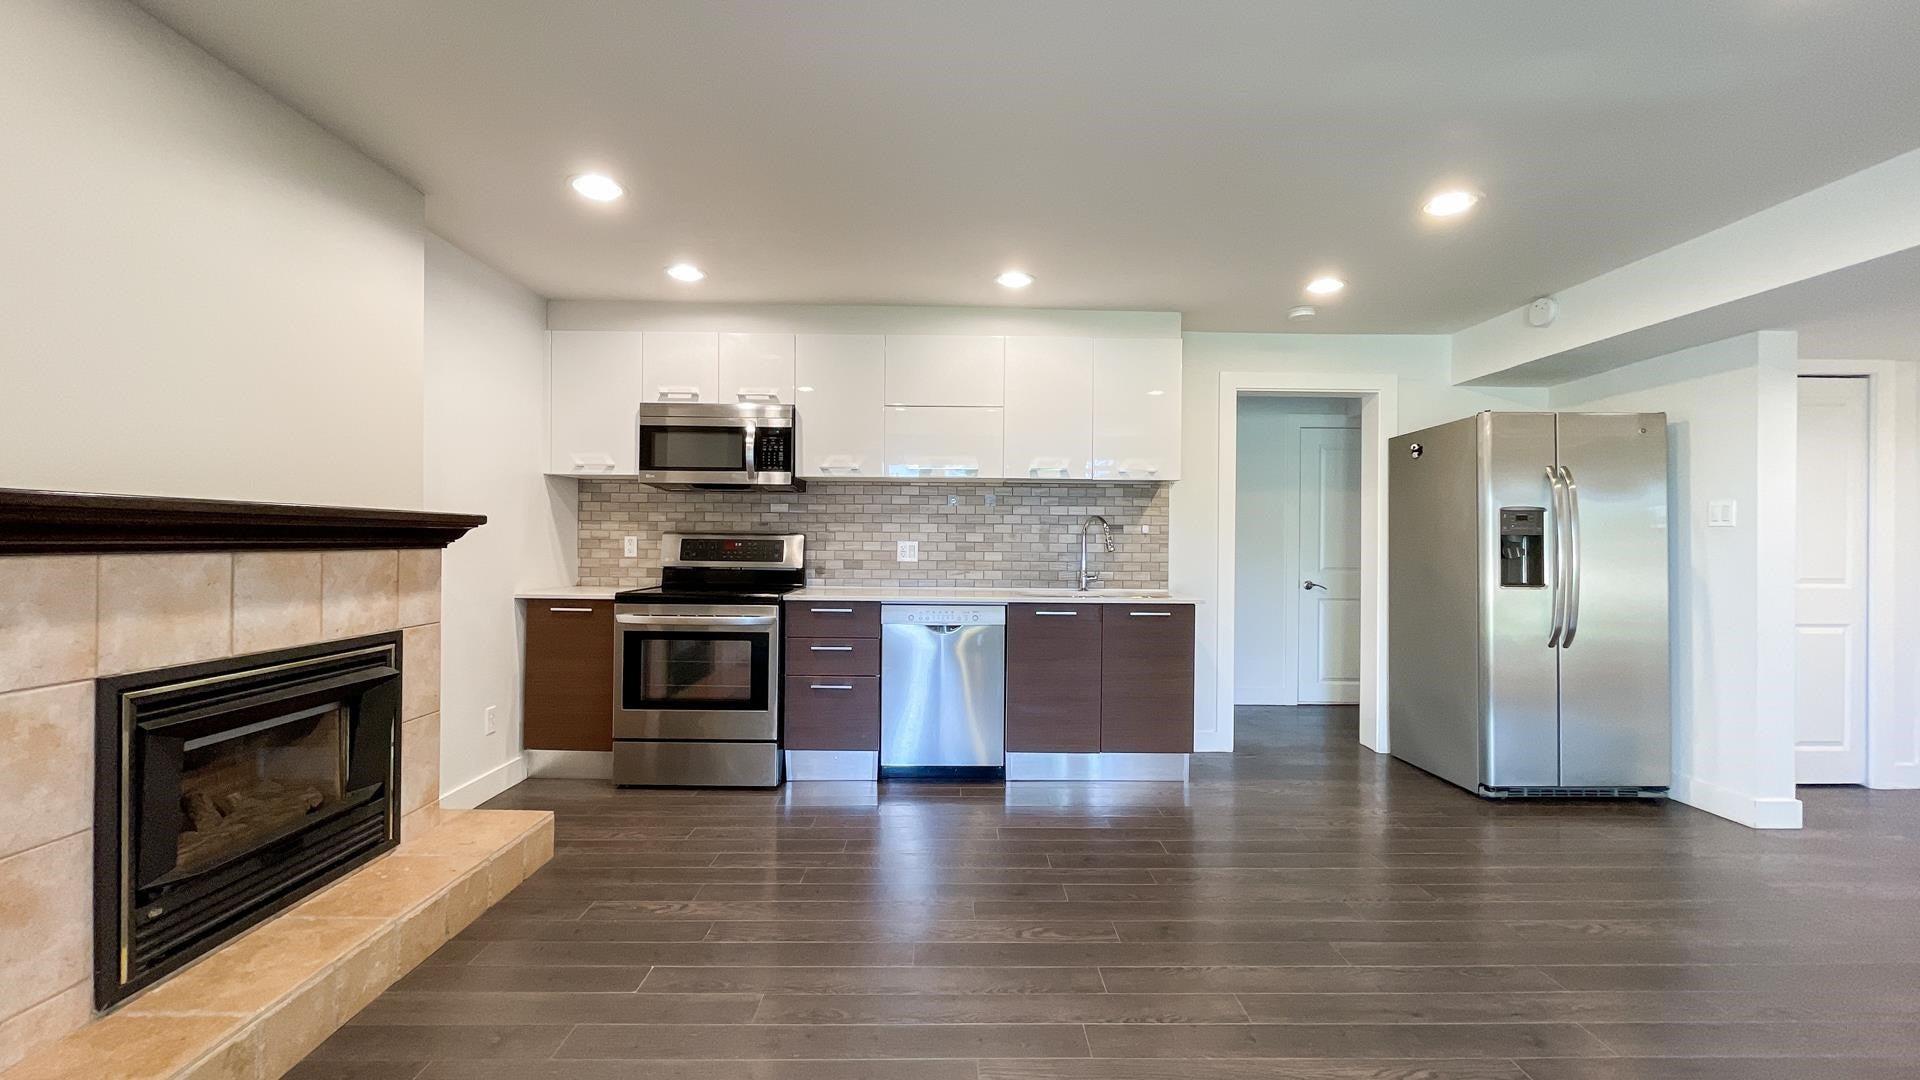 1168 JEFFERSON AVENUE - Ambleside House/Single Family for sale, 6 Bedrooms (R2602275) - #21